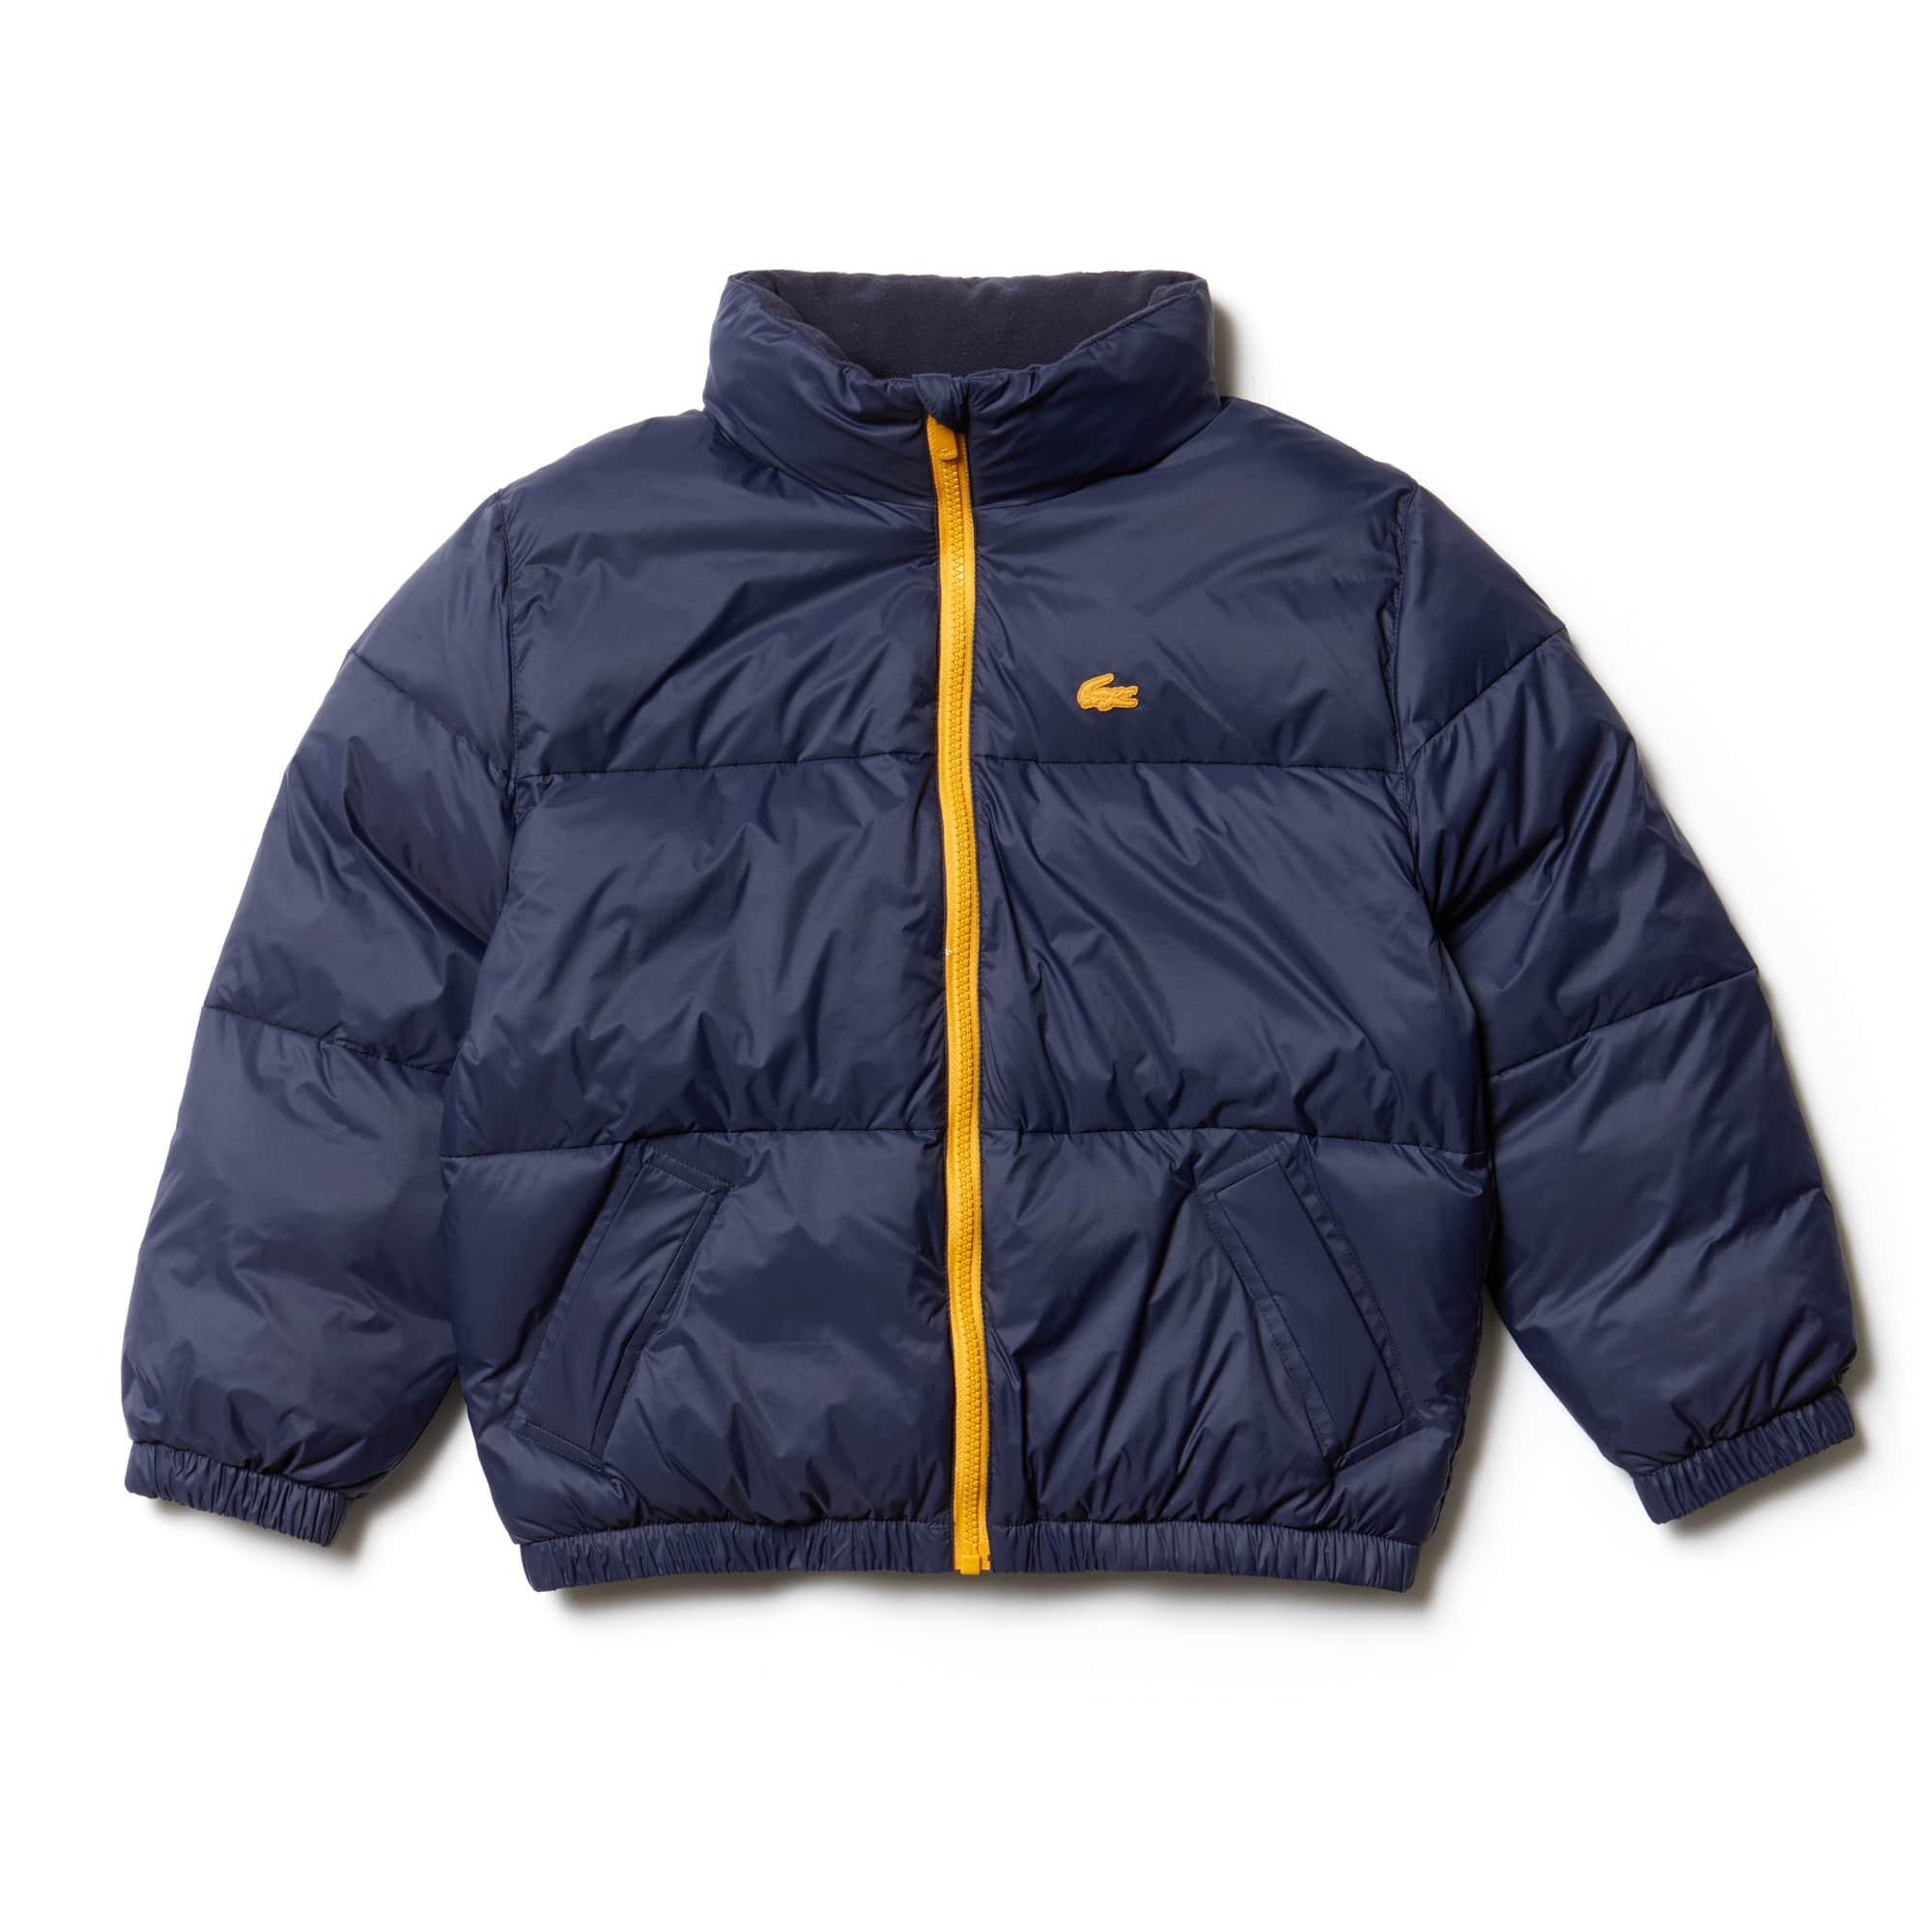 Coat Jacket For Boys